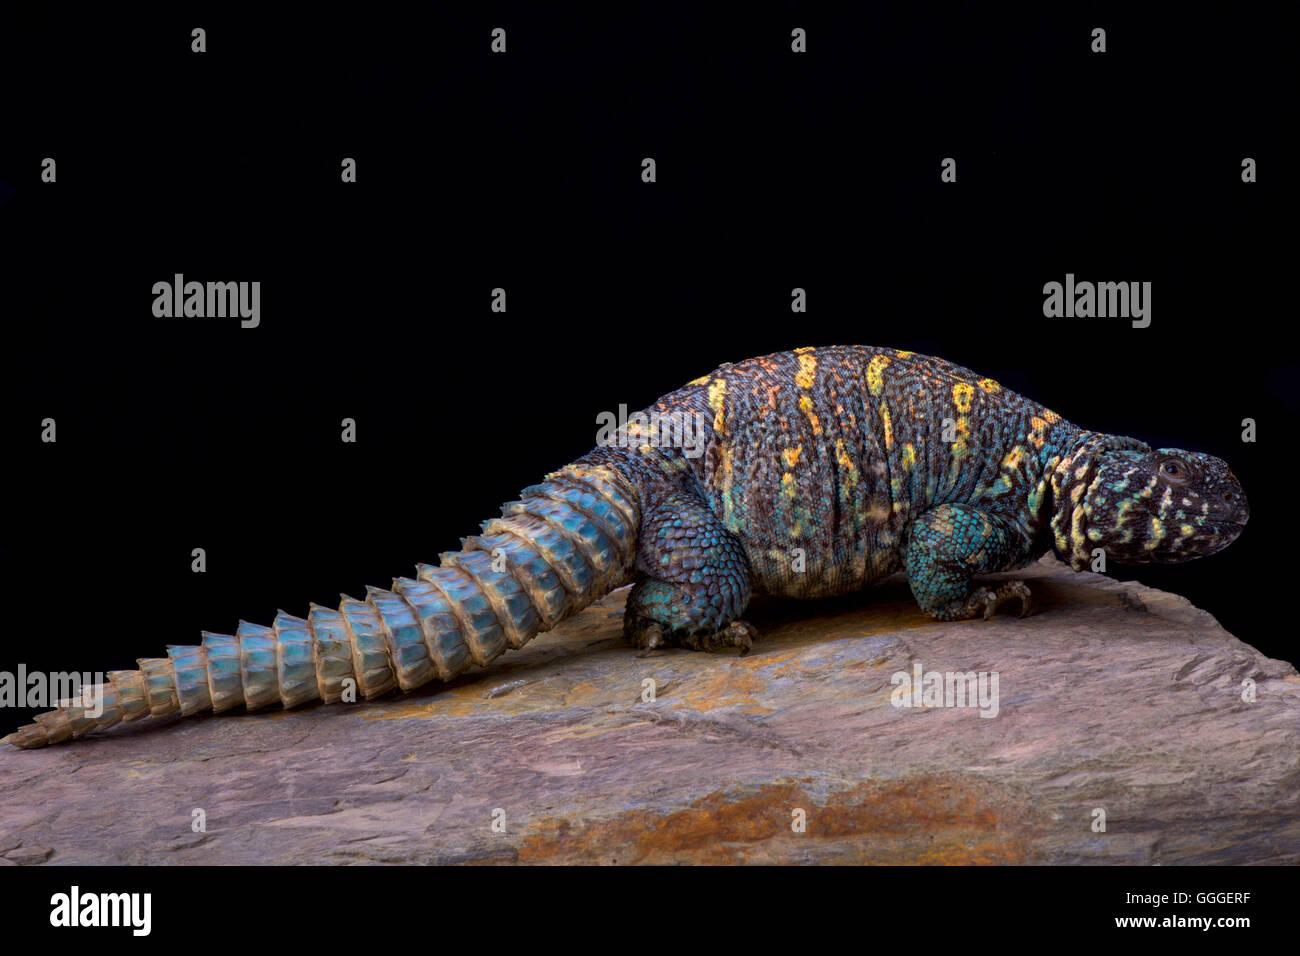 Ornate spiny-tailed lizard  (Uromastyx ornata ornata) - Stock Image